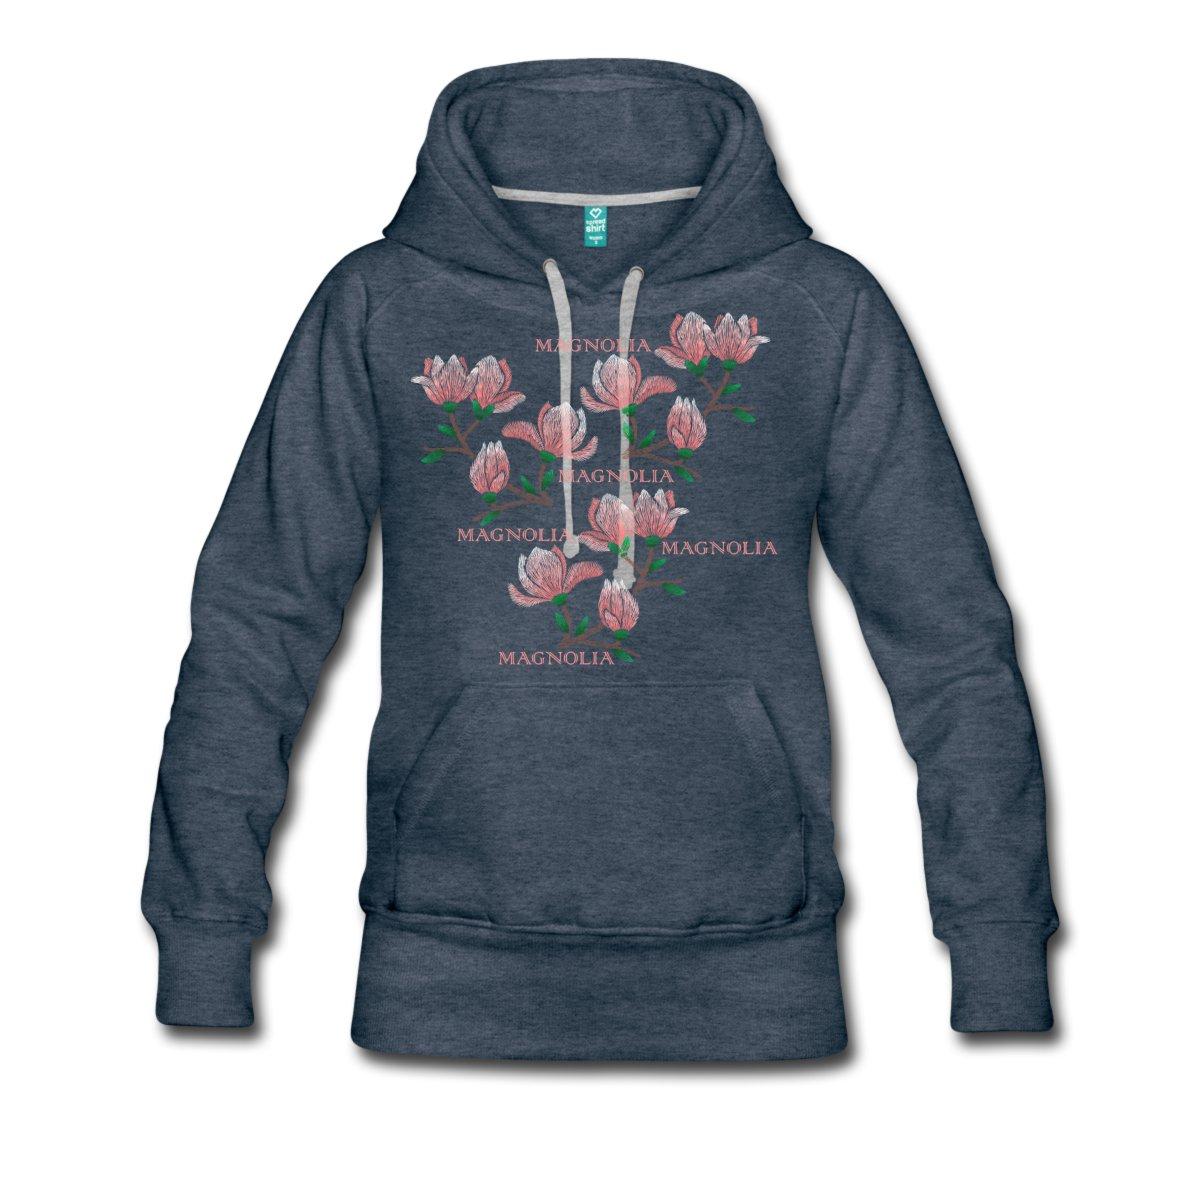 magnolia-premiumluvtroeja-dam-jb.jpg